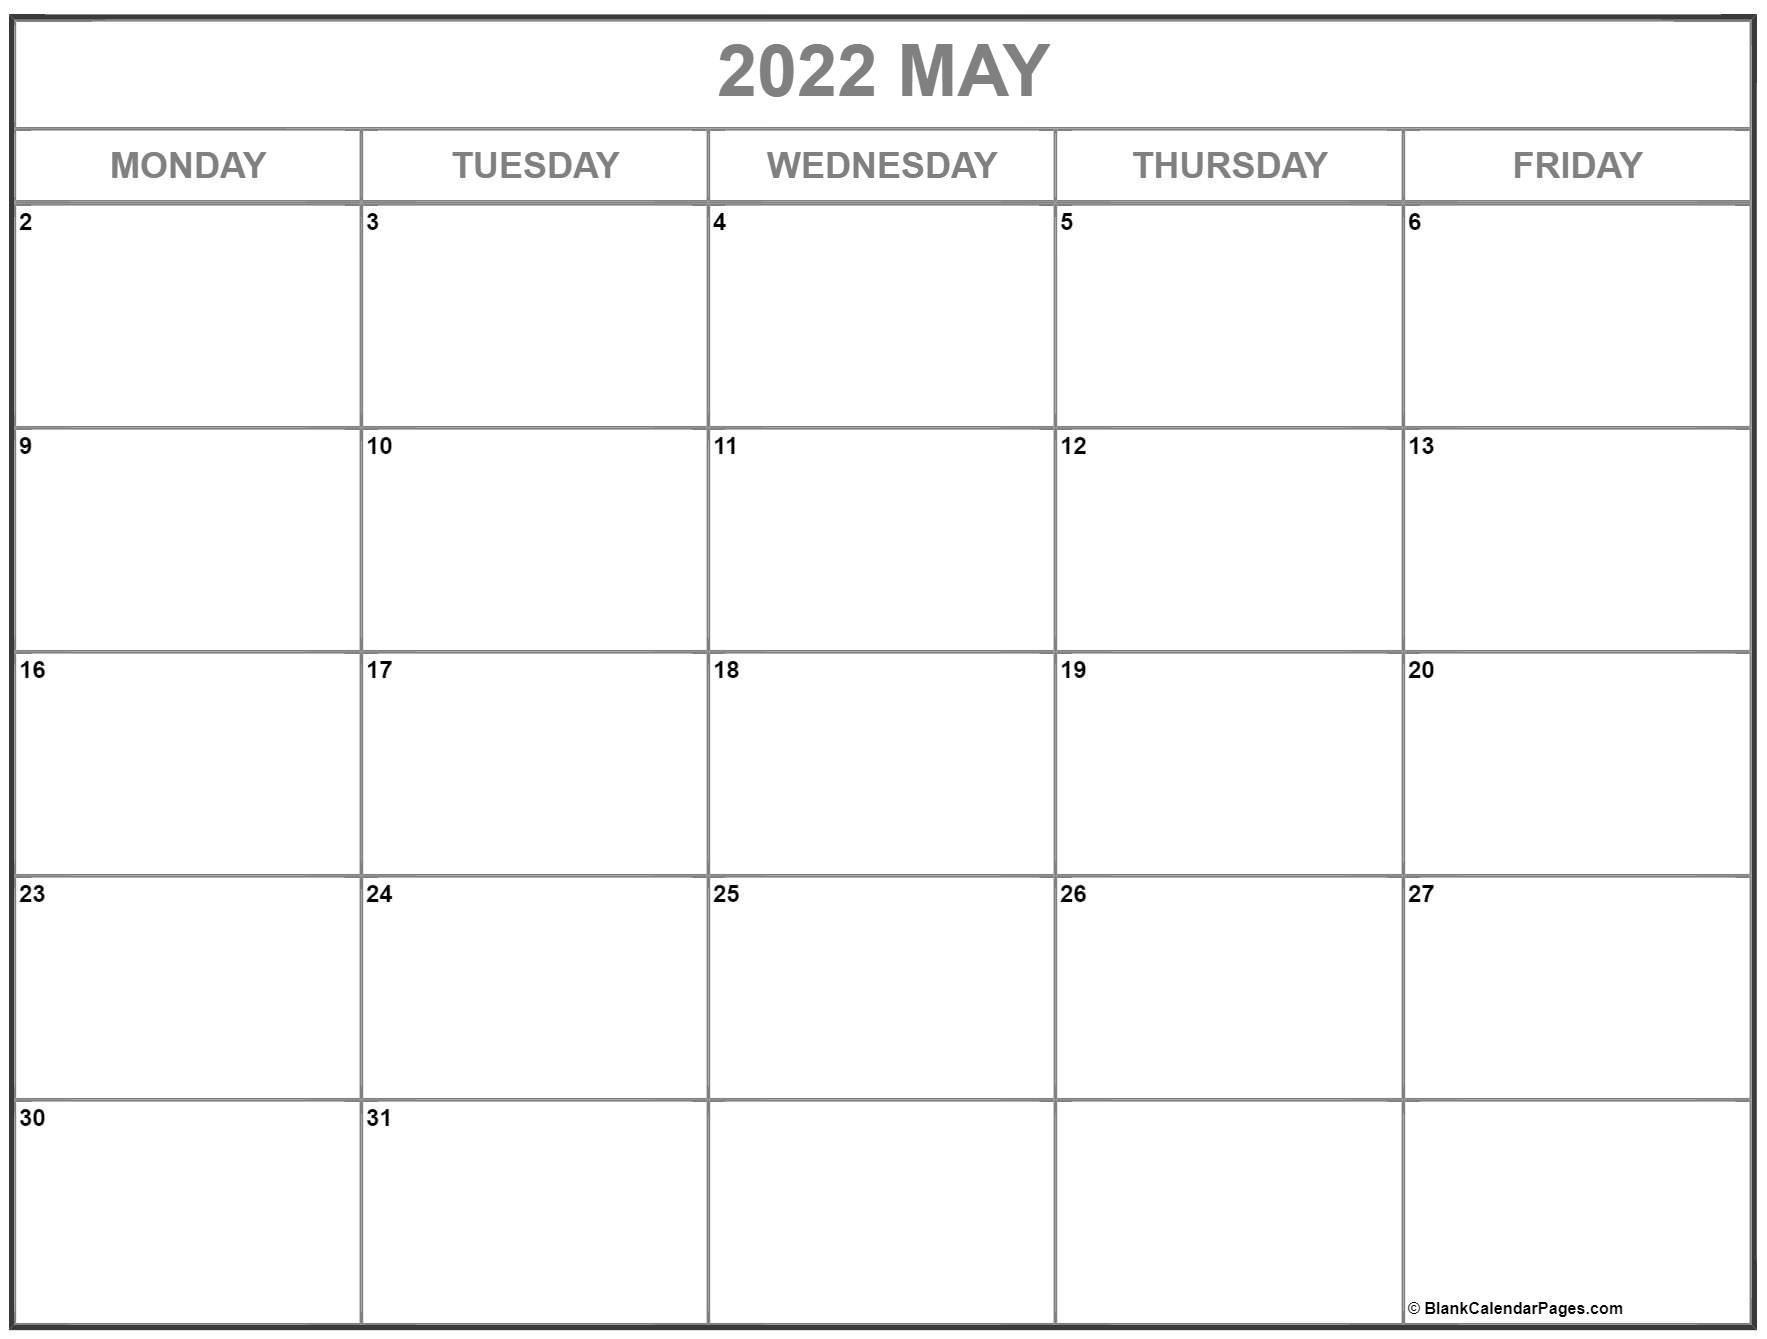 May 2022 Monday Calendar | Monday To Sunday Free Printable Monday Through Friday Calendar